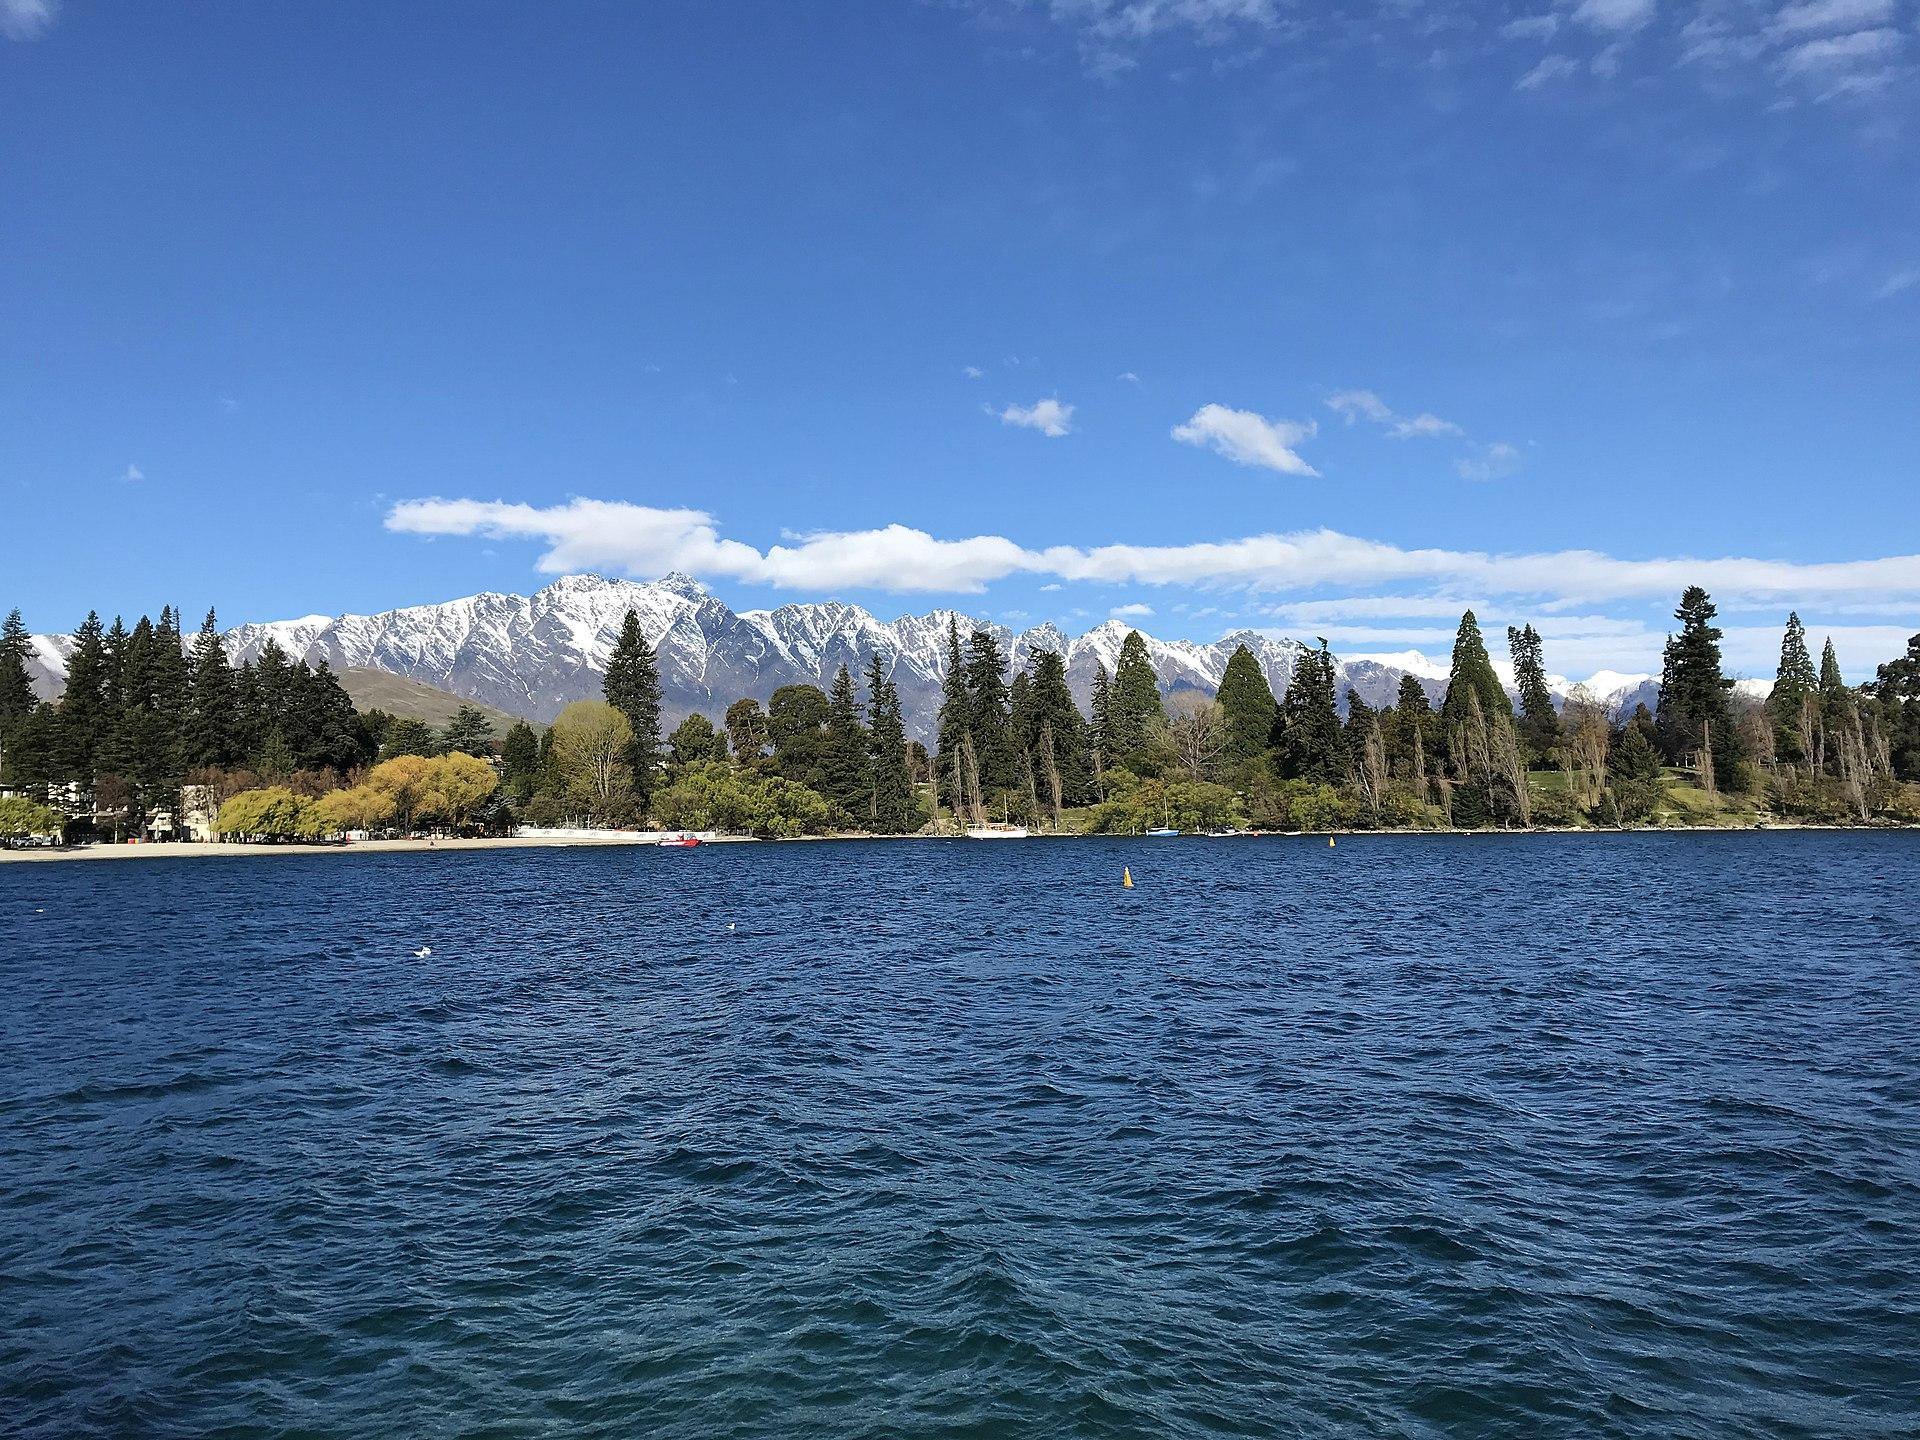 Lake Wakatipu and Remarkable Mountains, Queenstown. (Image: Coekon via wikimedia CC BY-SA 4.0)